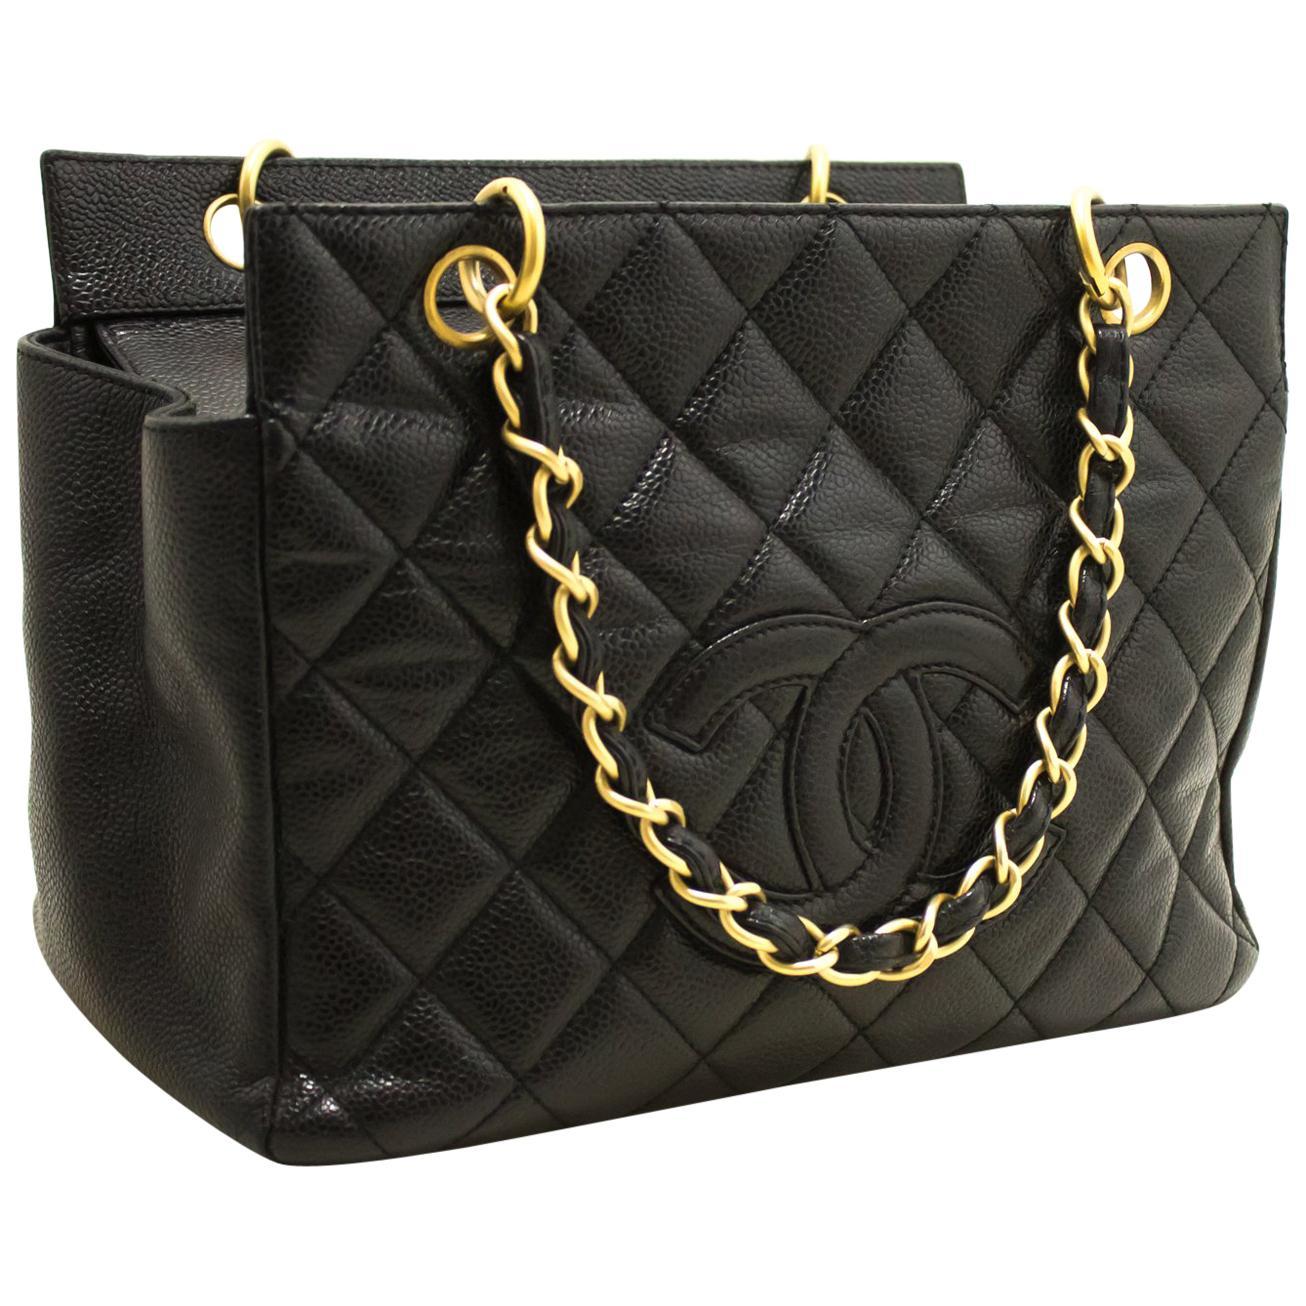 CHANEL Caviar Chain HandShopping Tote Bag